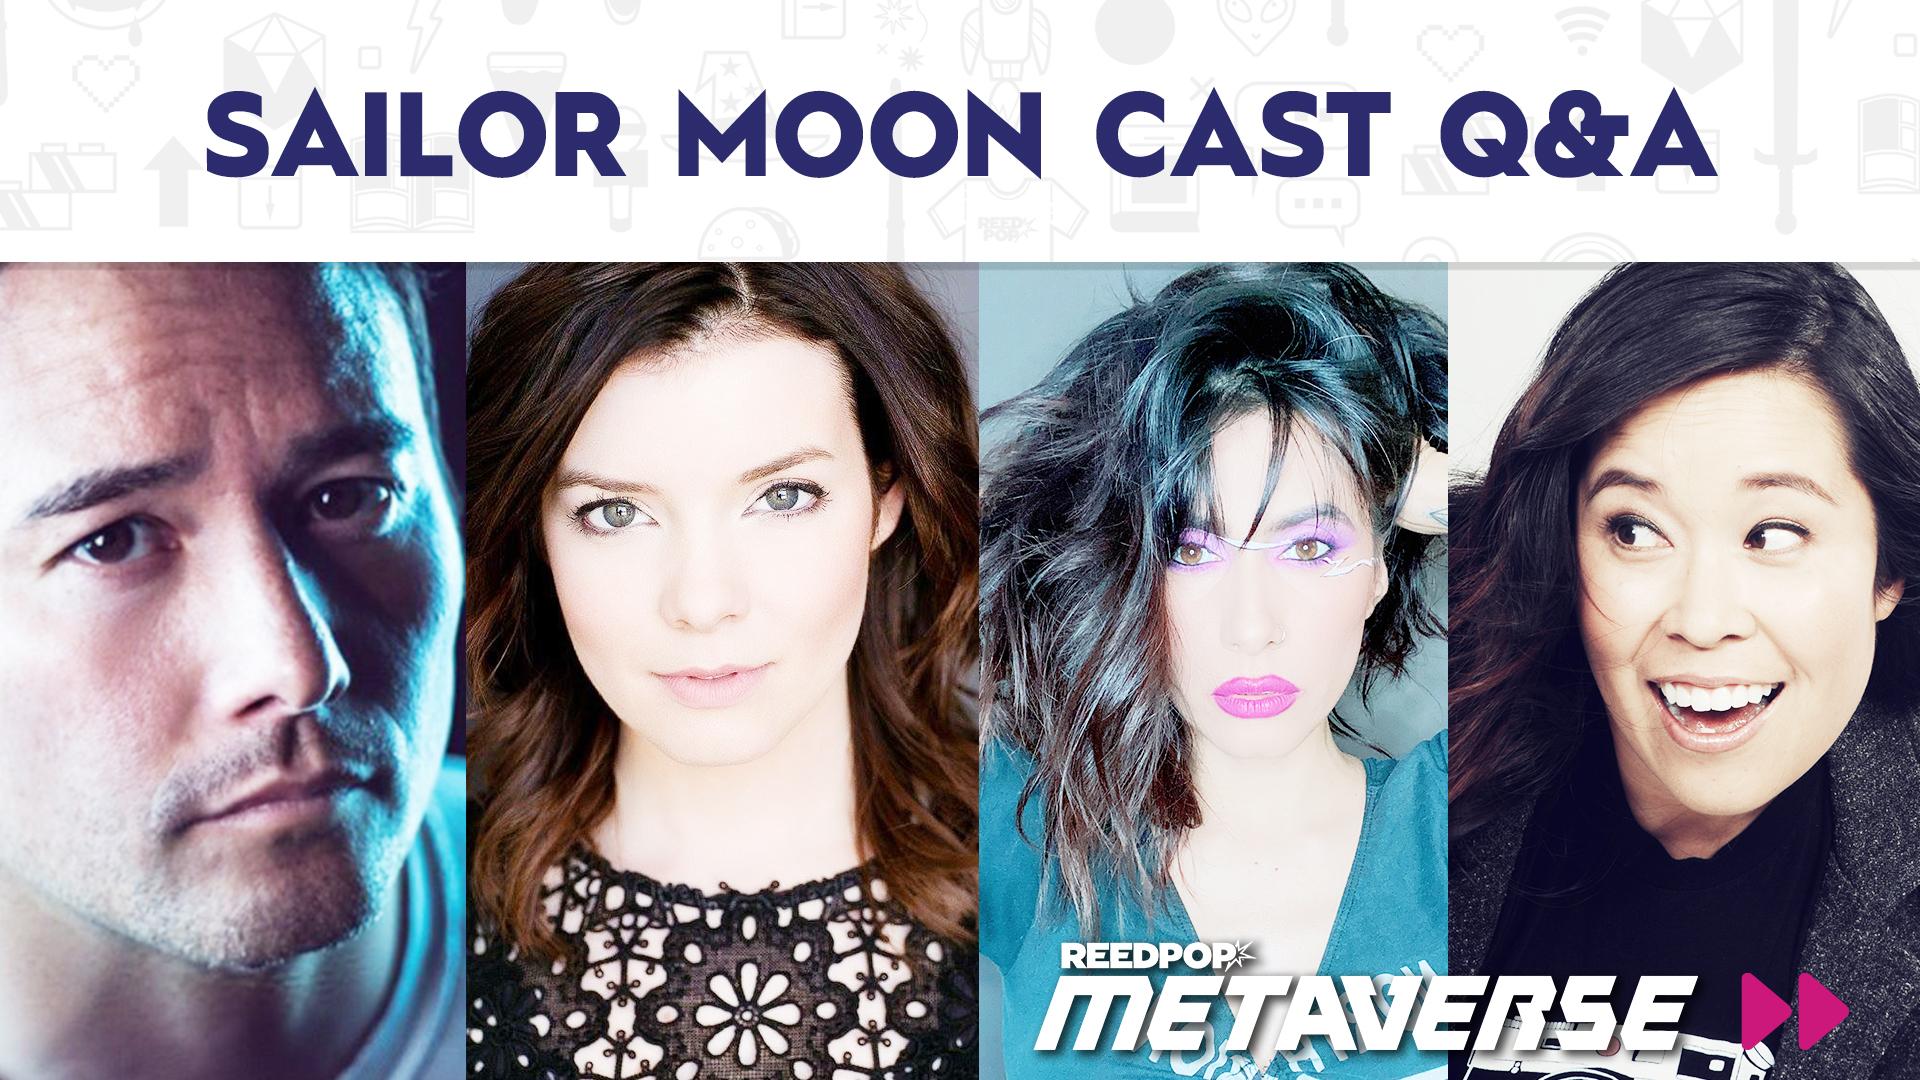 Image for Sailor Moon Cast Q&A Panel